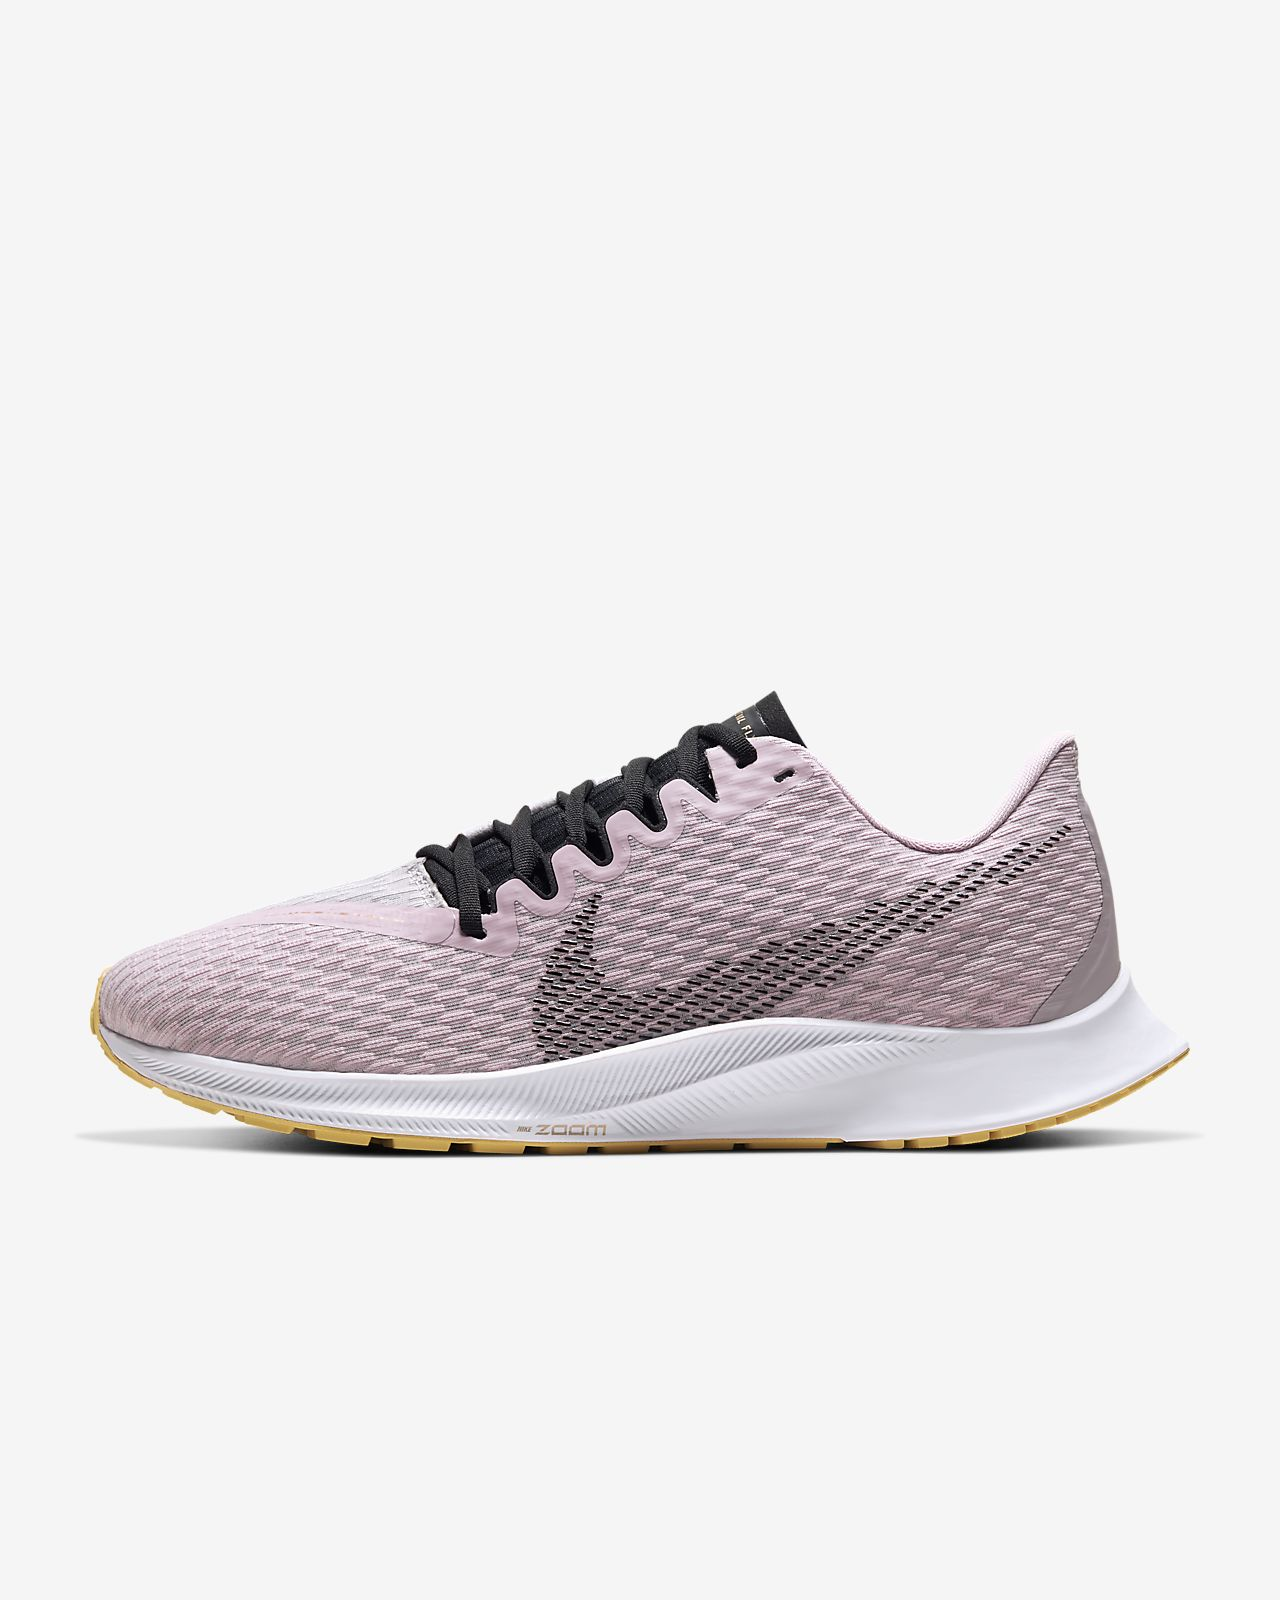 Nike Zoom Rival Fly 2 Women's Running Shoe. Nike DK